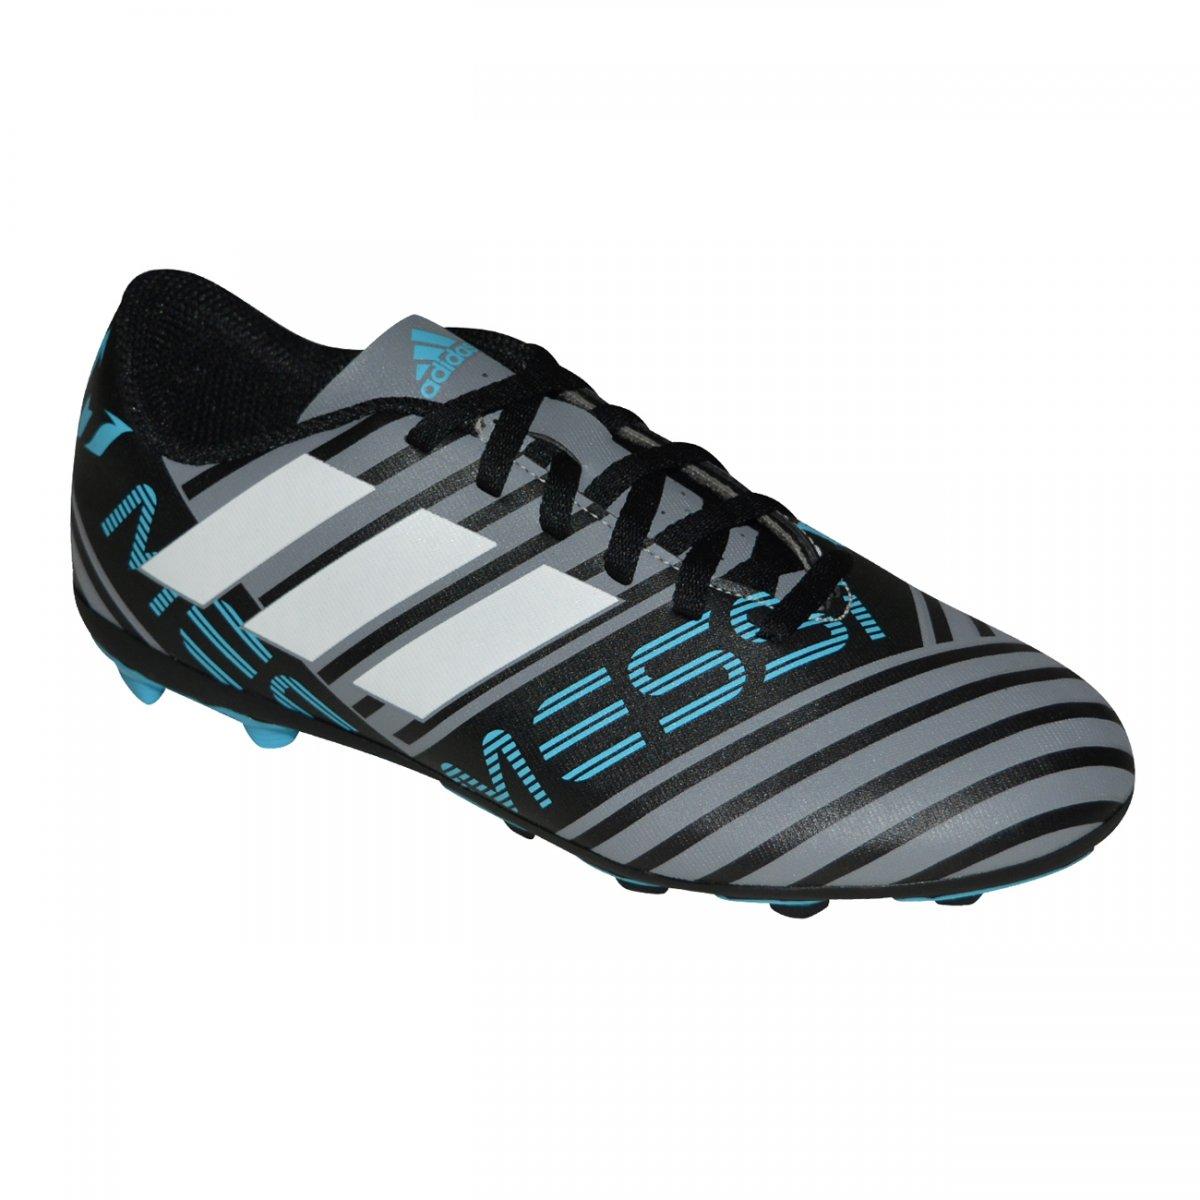 4fa60a87eb Chuteira Adidas Nemeziz Messi 17.4 Juvenil CP9211 - Chumbo preto branco -  Chuteira Nike